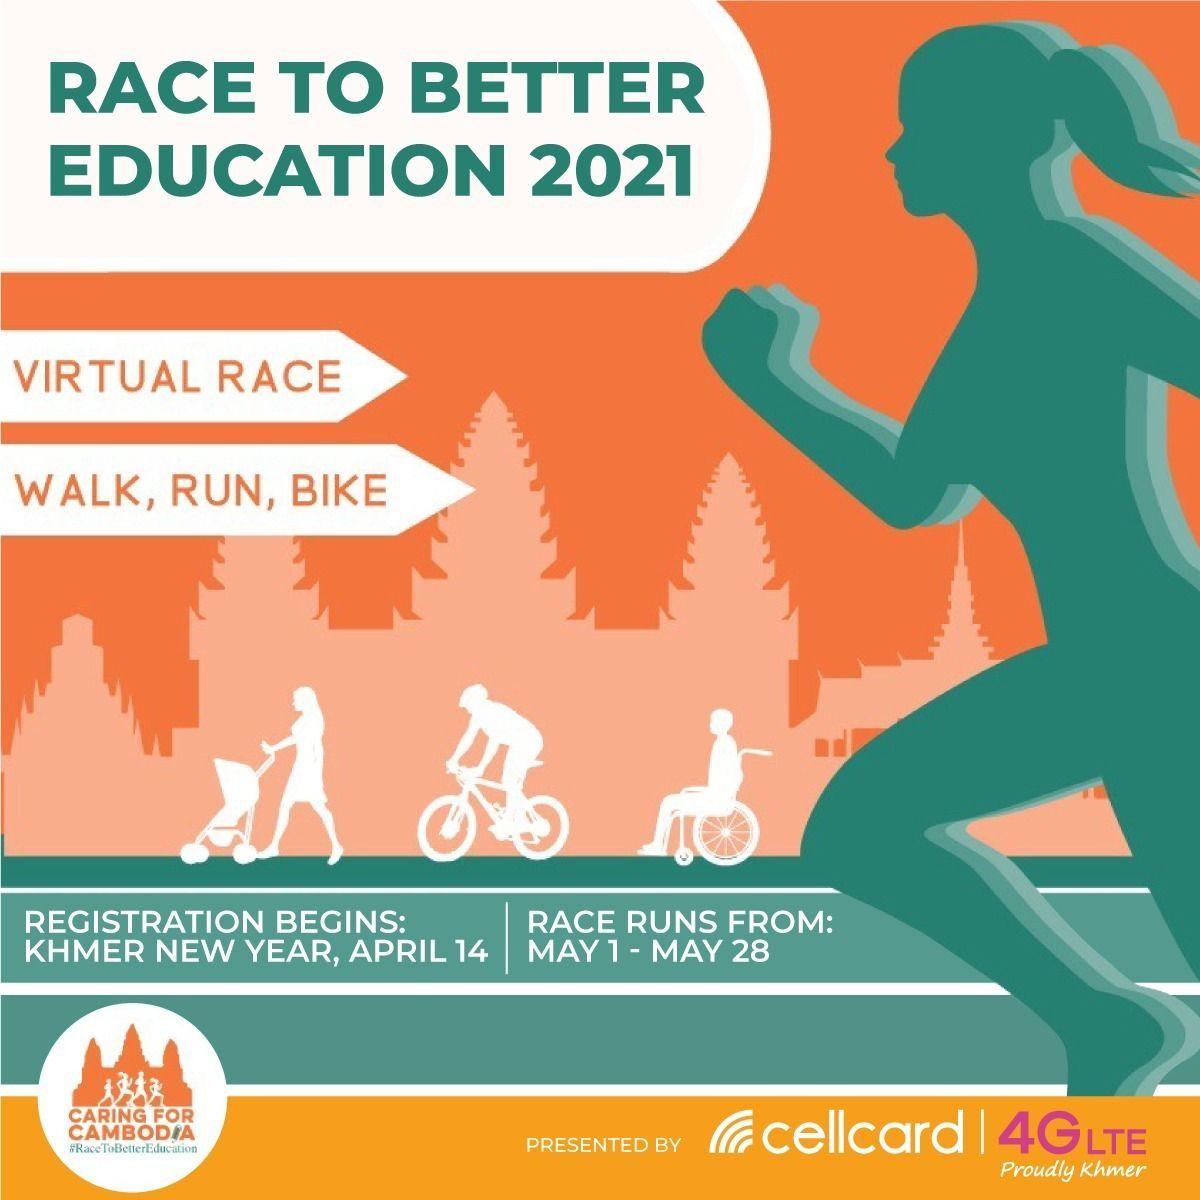 Race to Better Education Kicks Off Saturday, May 1